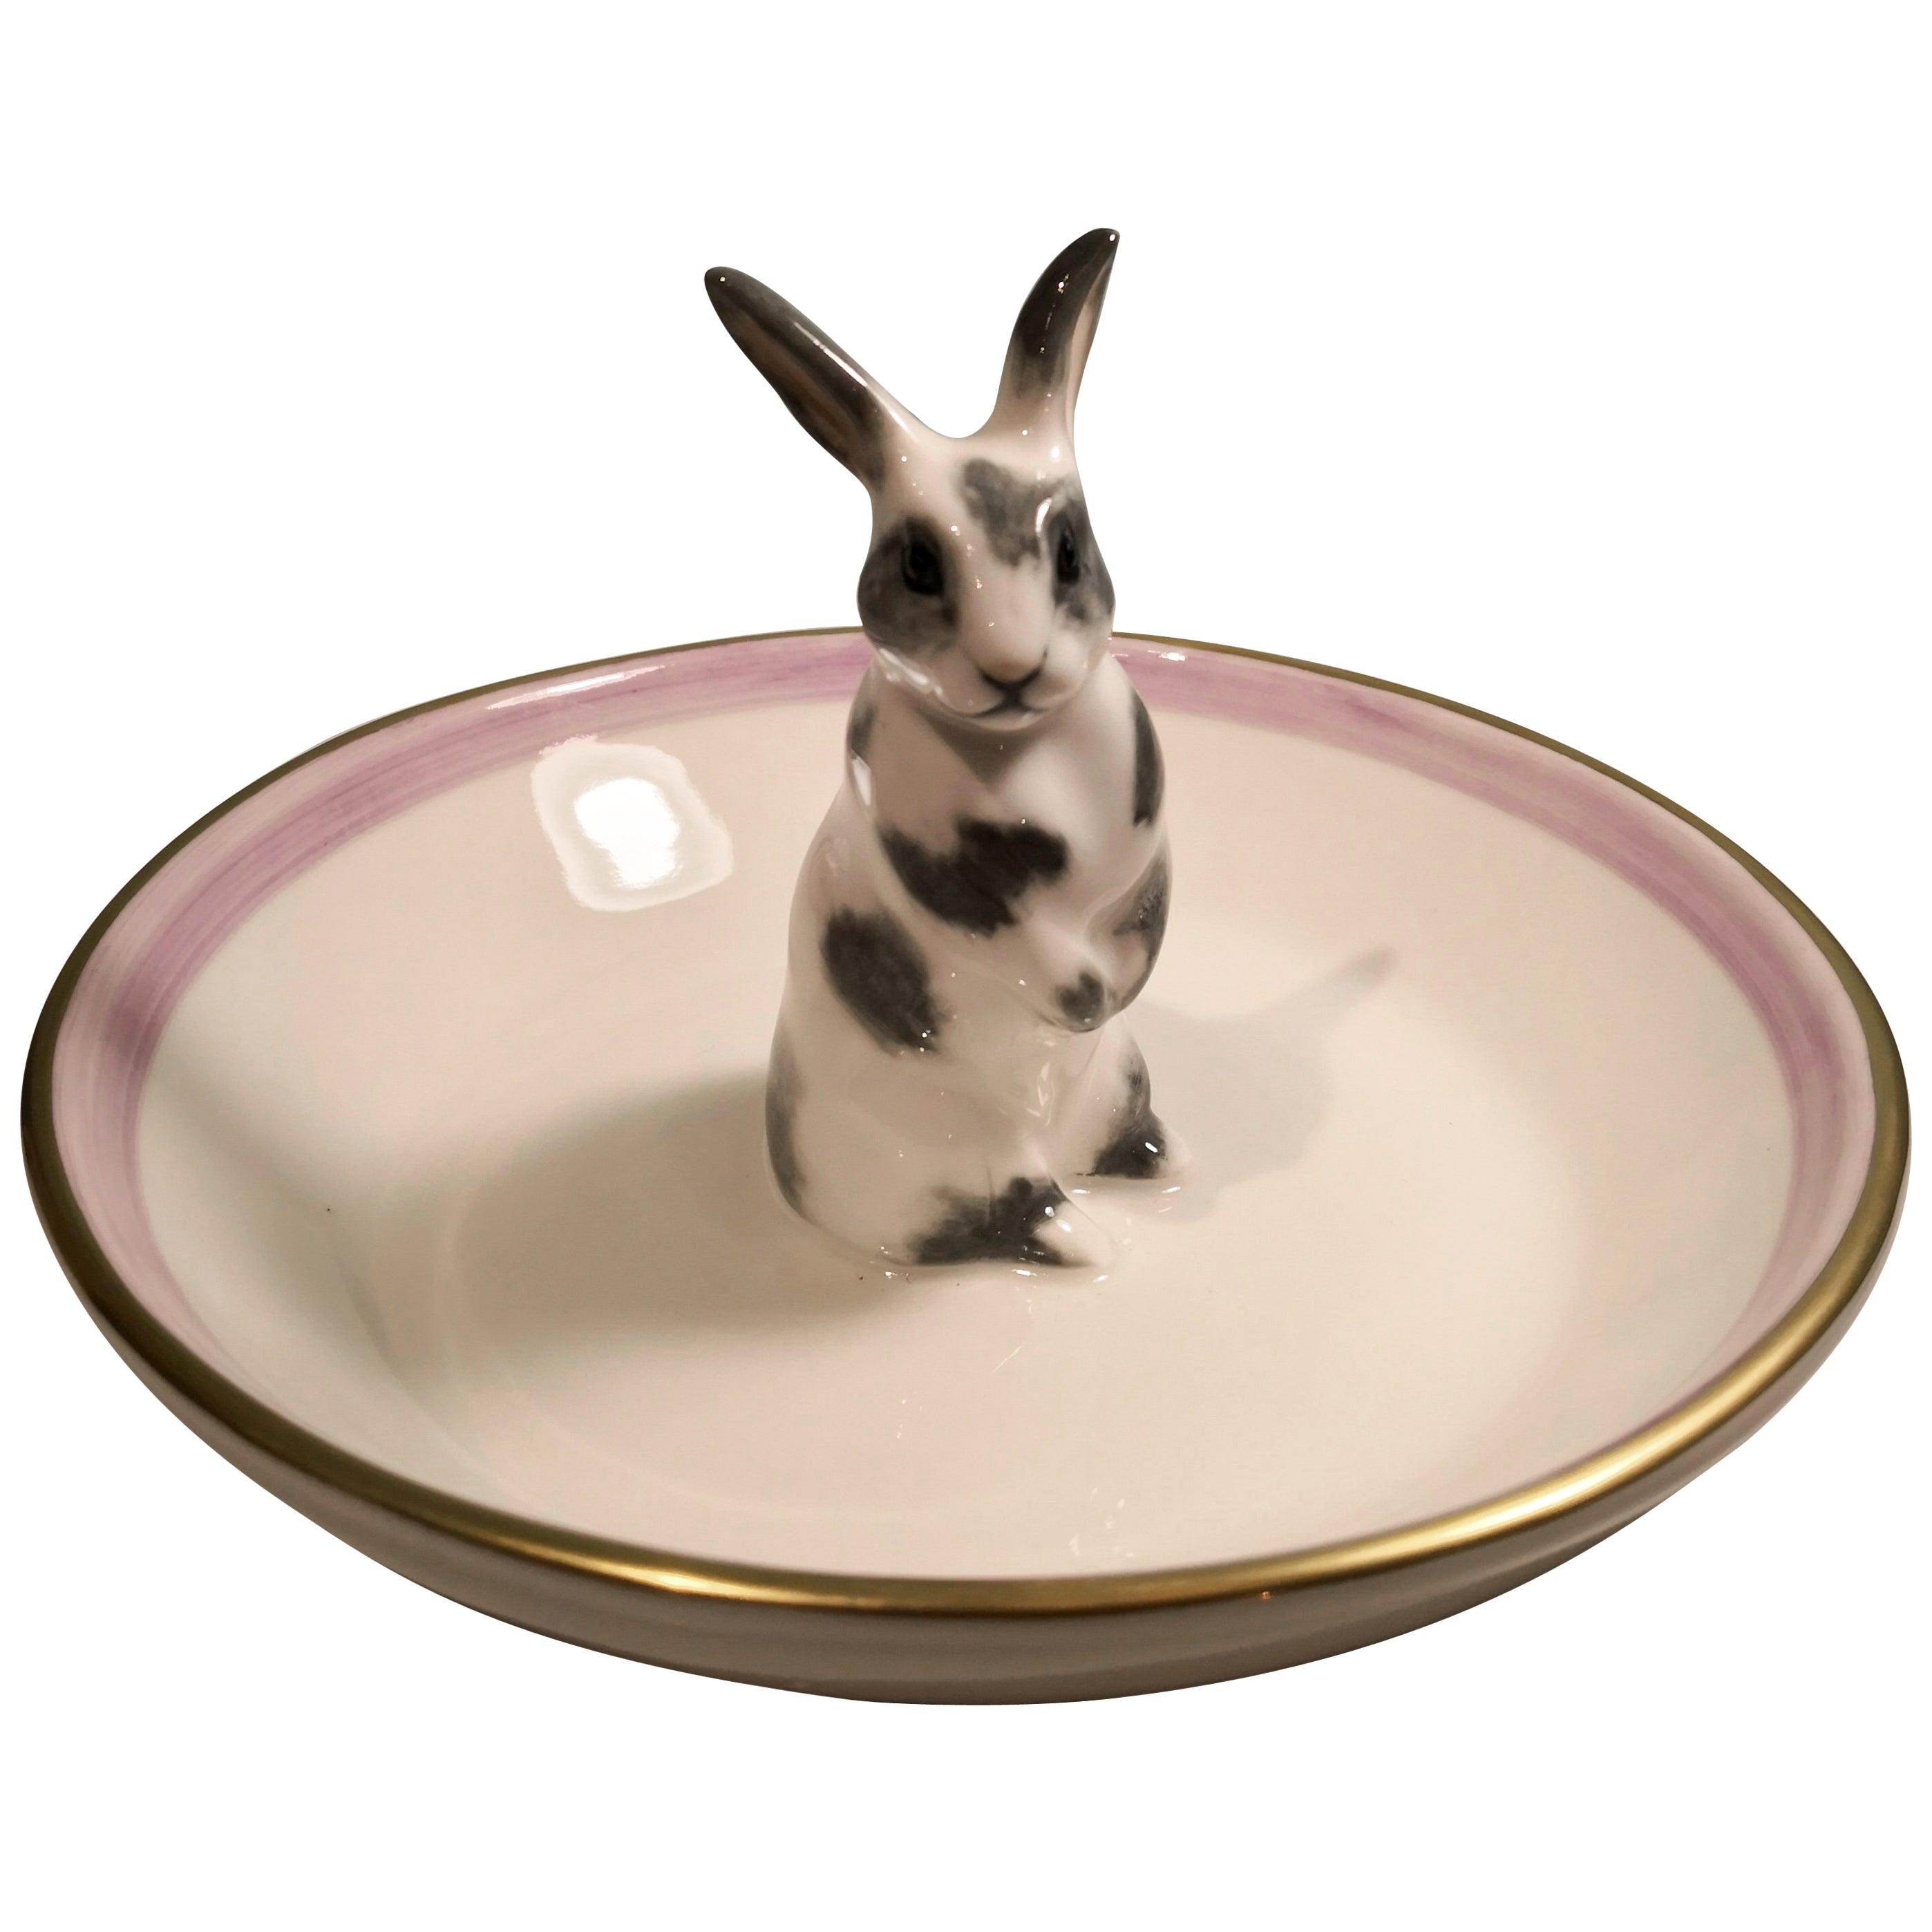 Country Style Porcelain Bowl Easter Bunny Figure Sofina Boutique Kitzbuehel